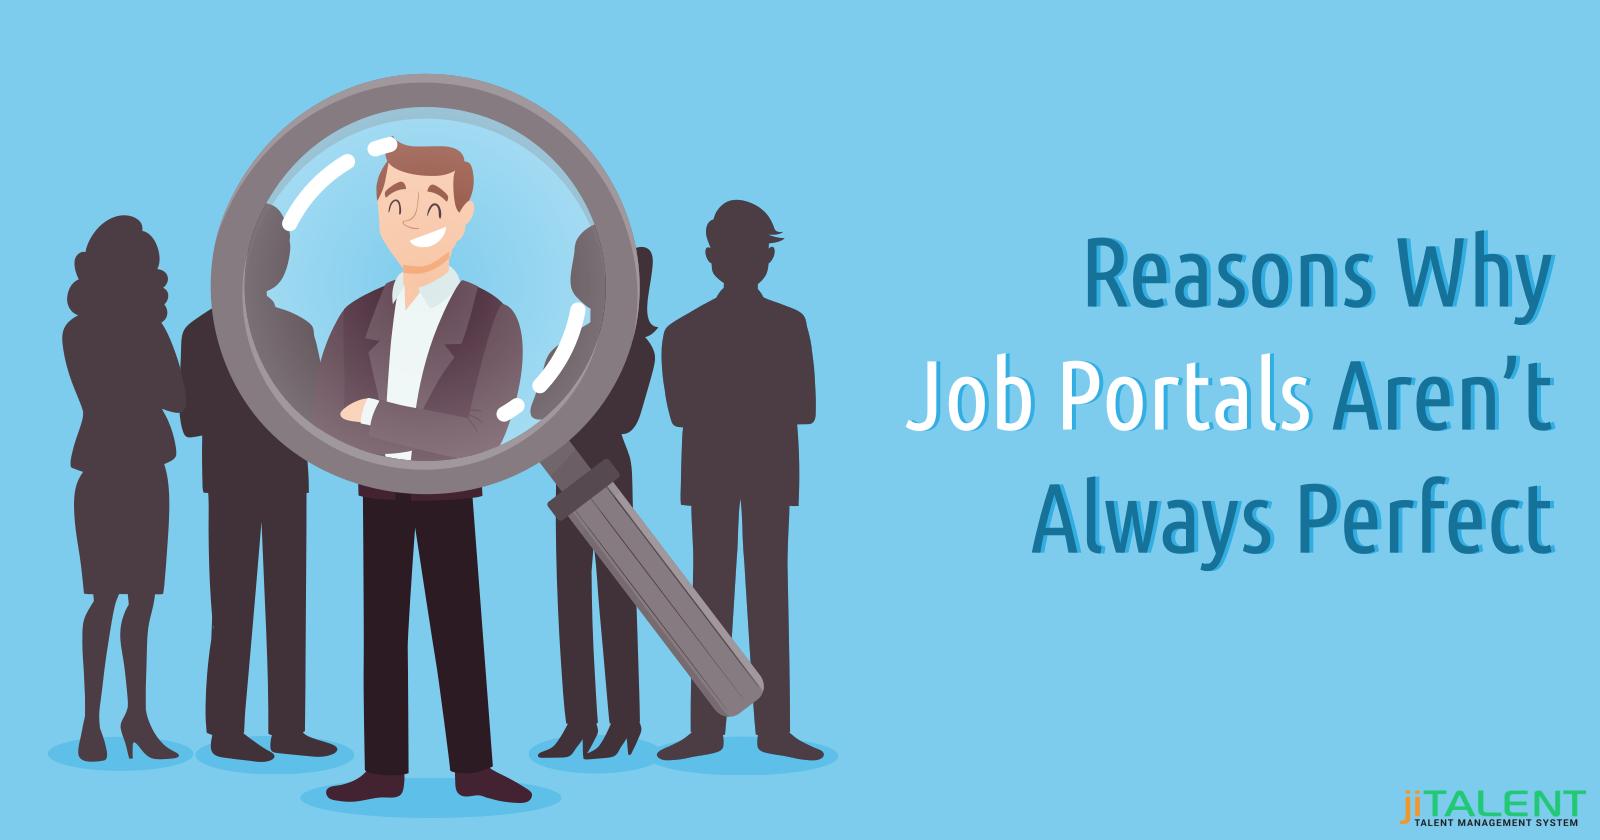 Reasons Why Job Portals Aren't Always Perfect